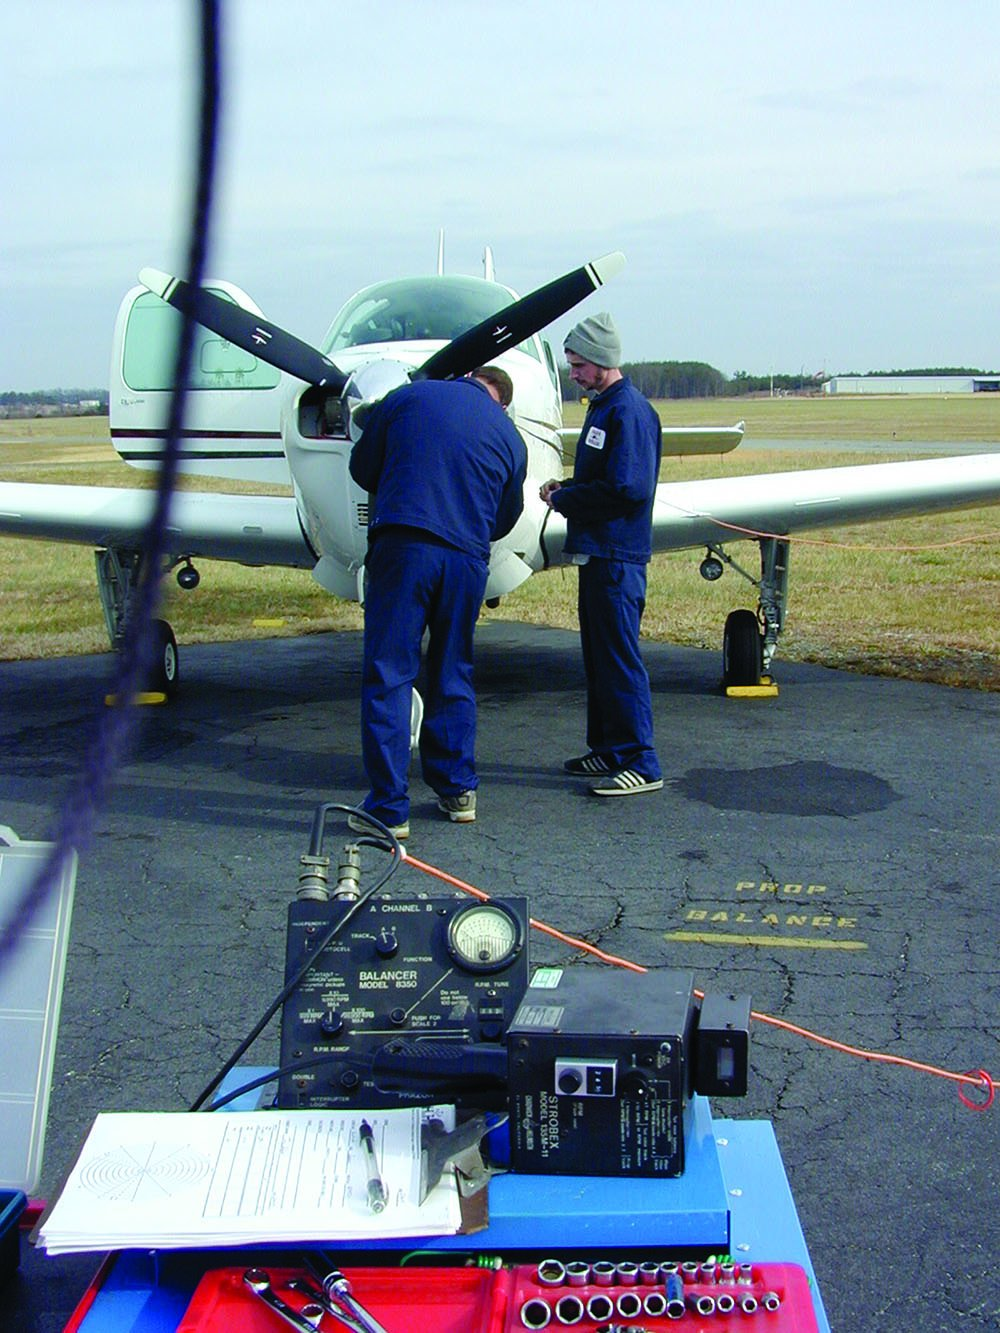 men balancing an aircraft propeller